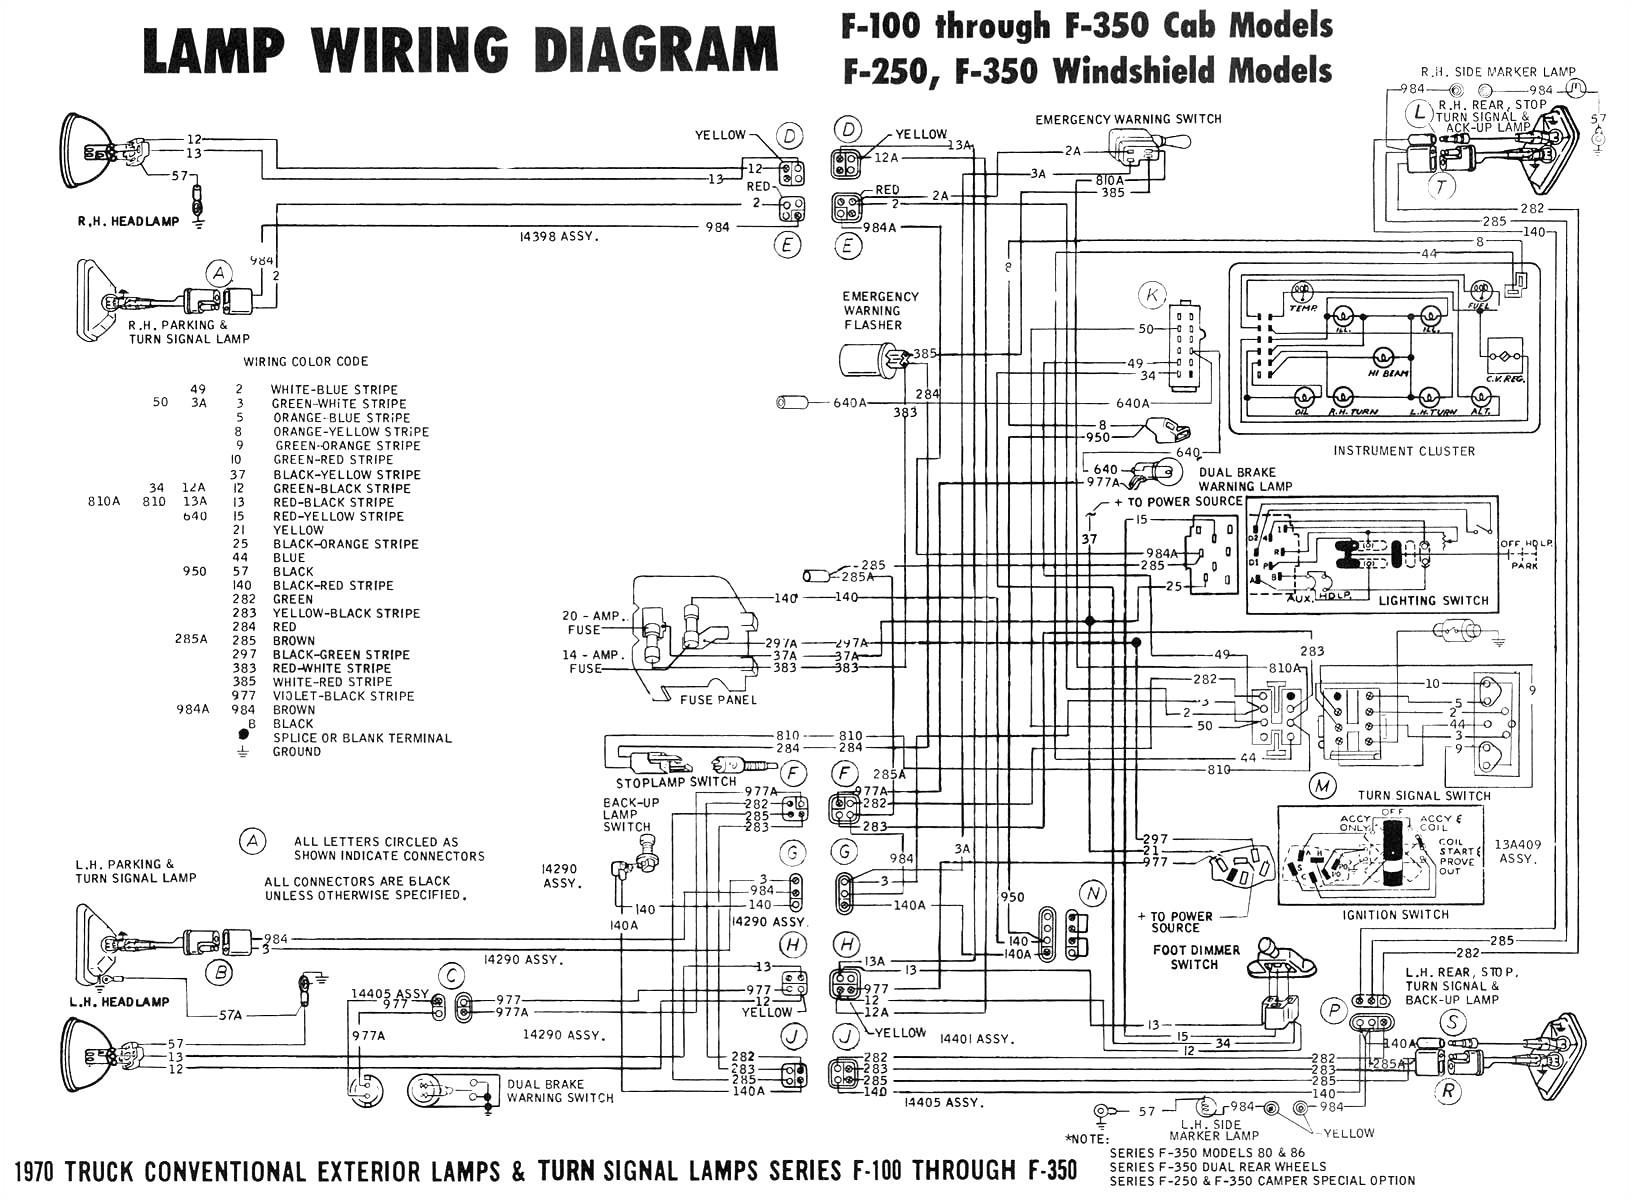 1986 ford f 150 headlight wiring wiring diagram used 1986 ford f 150 headlight wiring